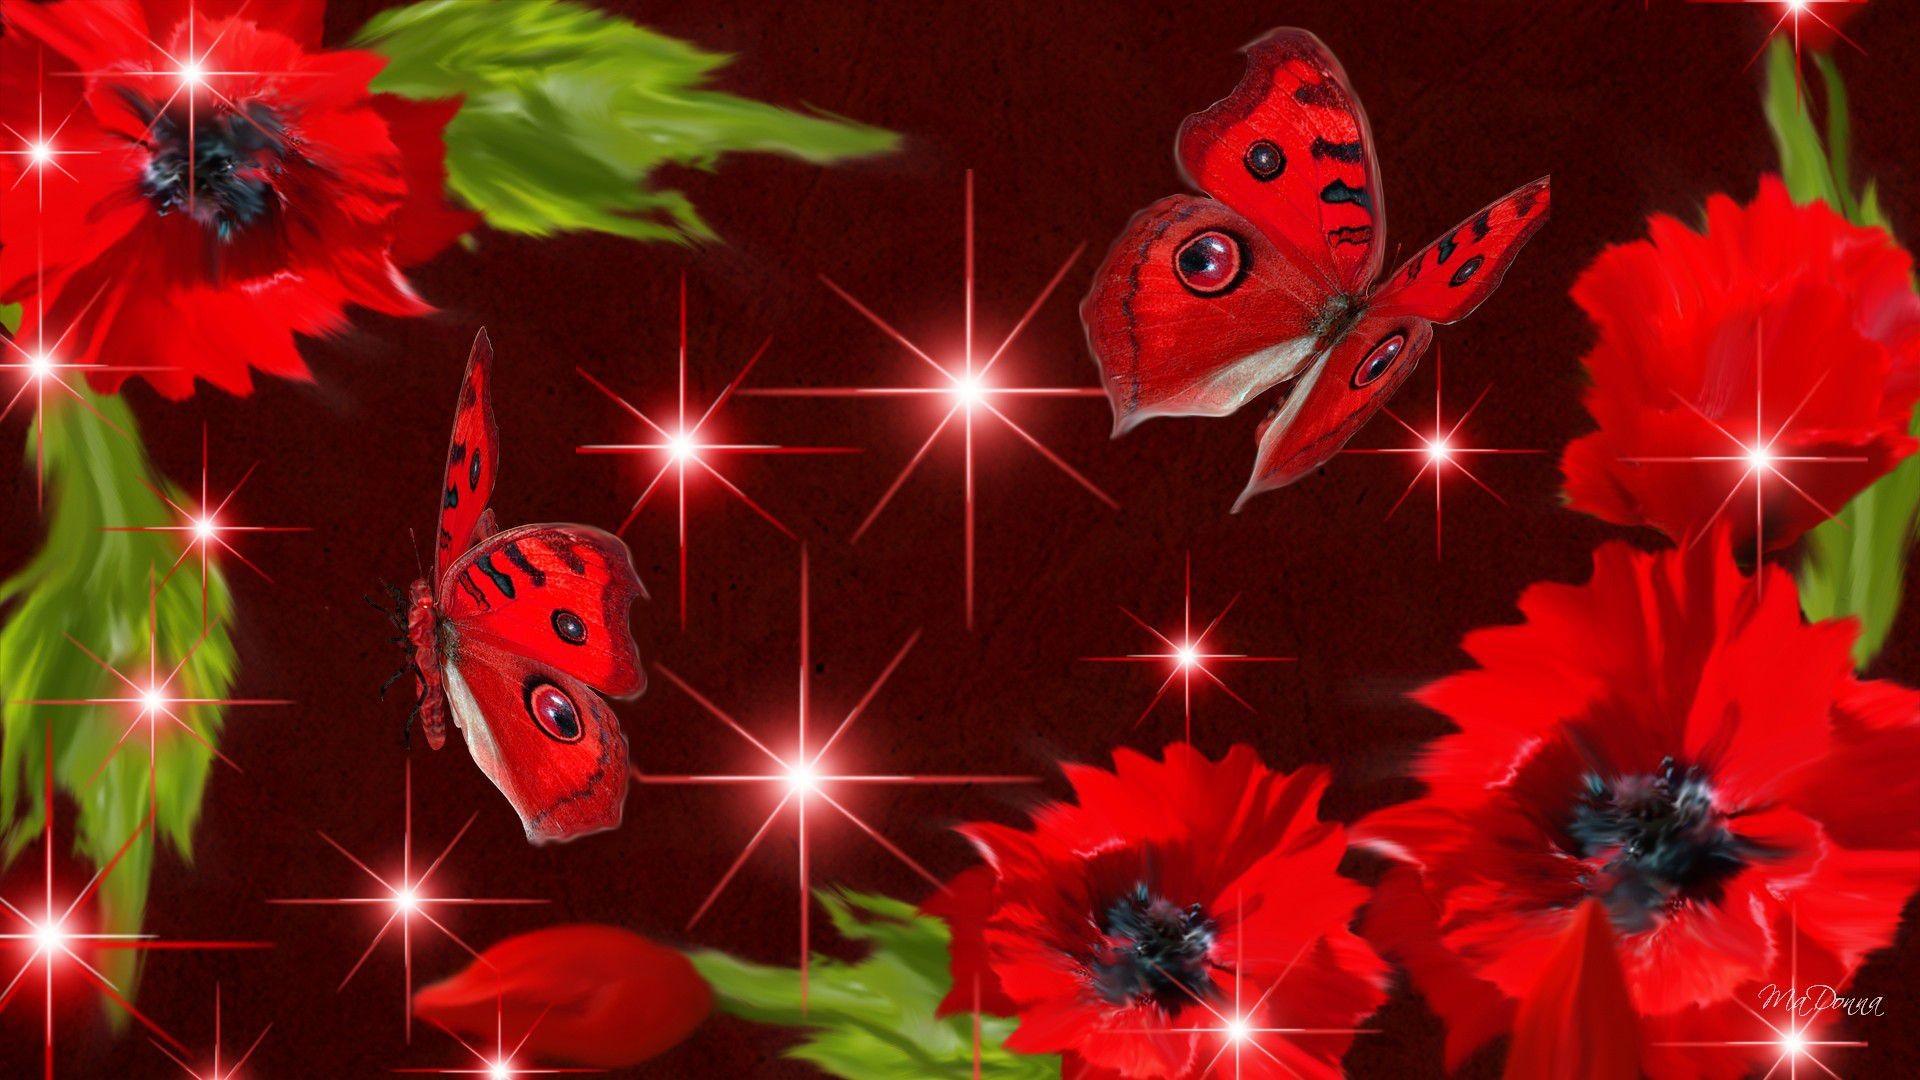 Res: 1920x1080, 3d stars red poppies butterflies sparkles summer flower